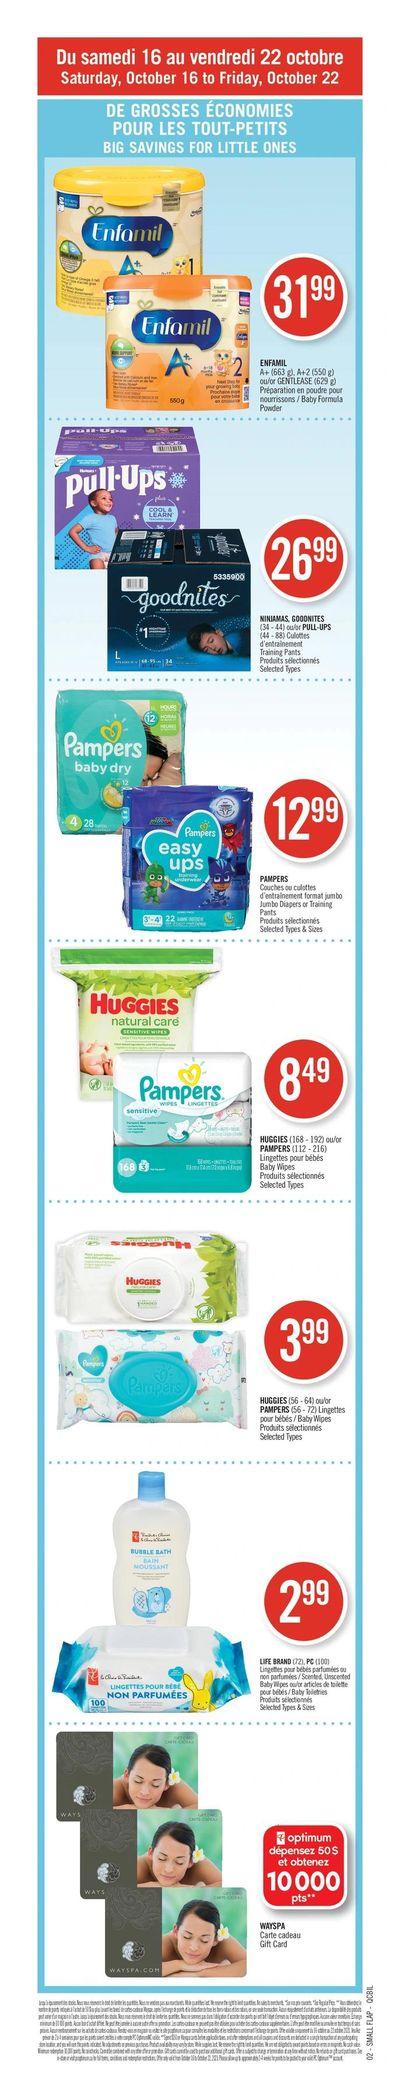 Pharmaprix Flyer October 16 to 22